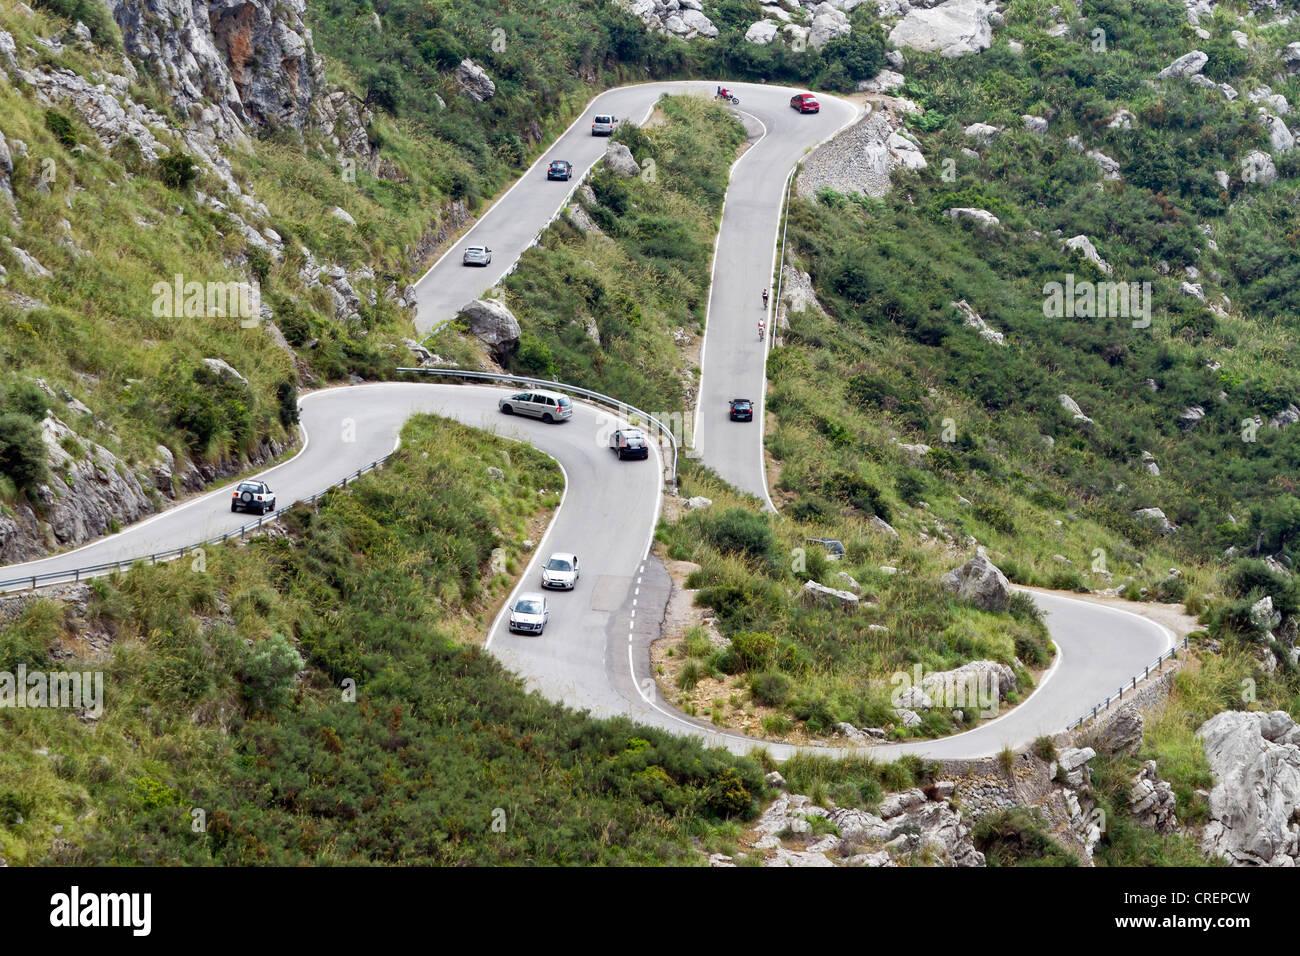 Road to Sa Calobra, Majorca island, Balearic Islands, Spain, Europe - Stock Image